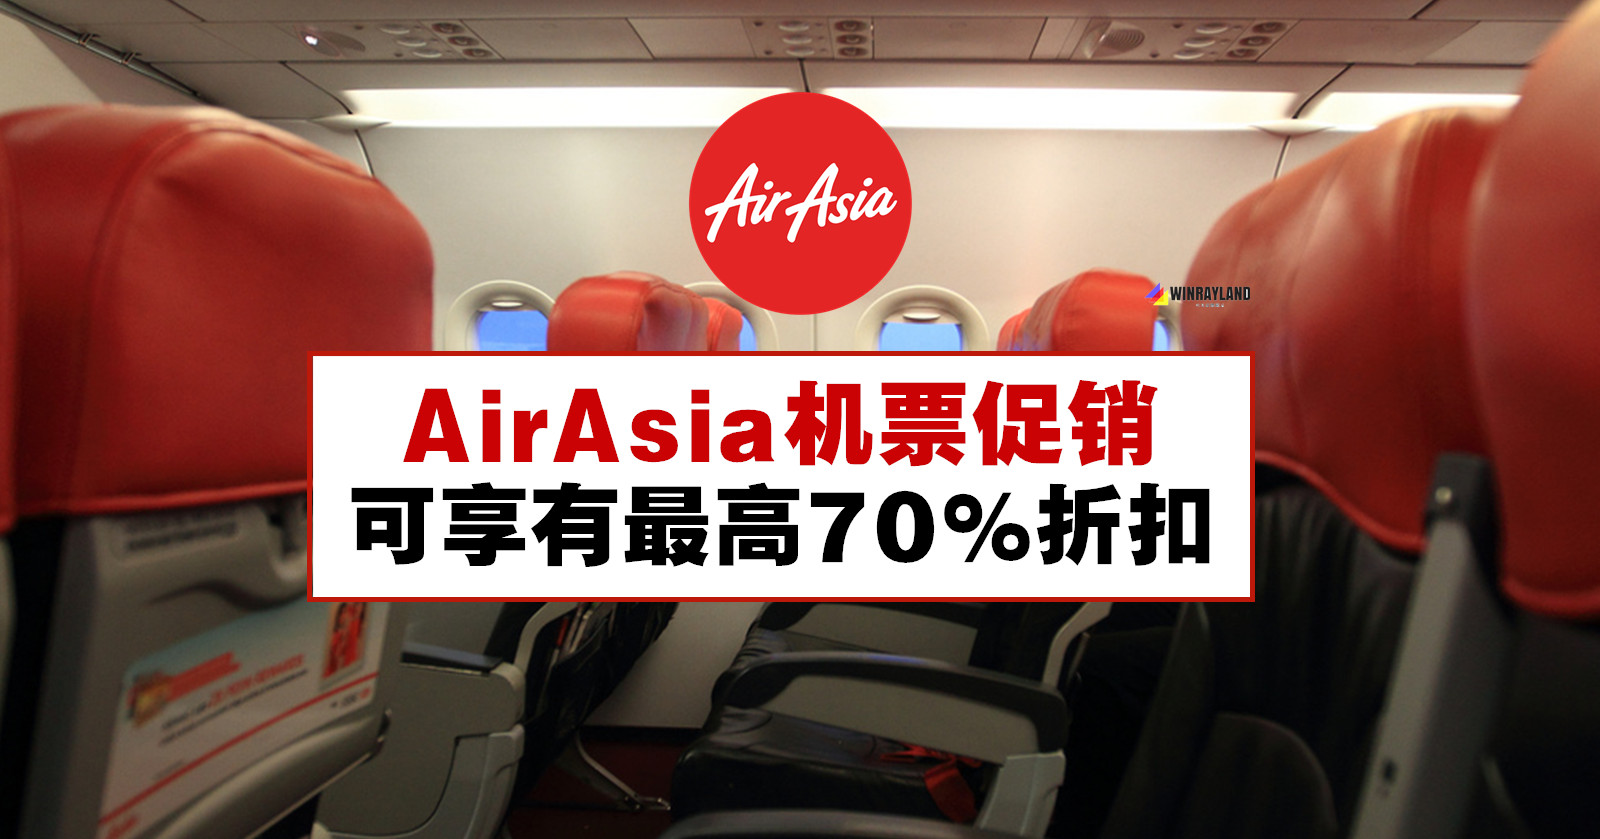 AirAsia机票促销,可享有最高70%折扣